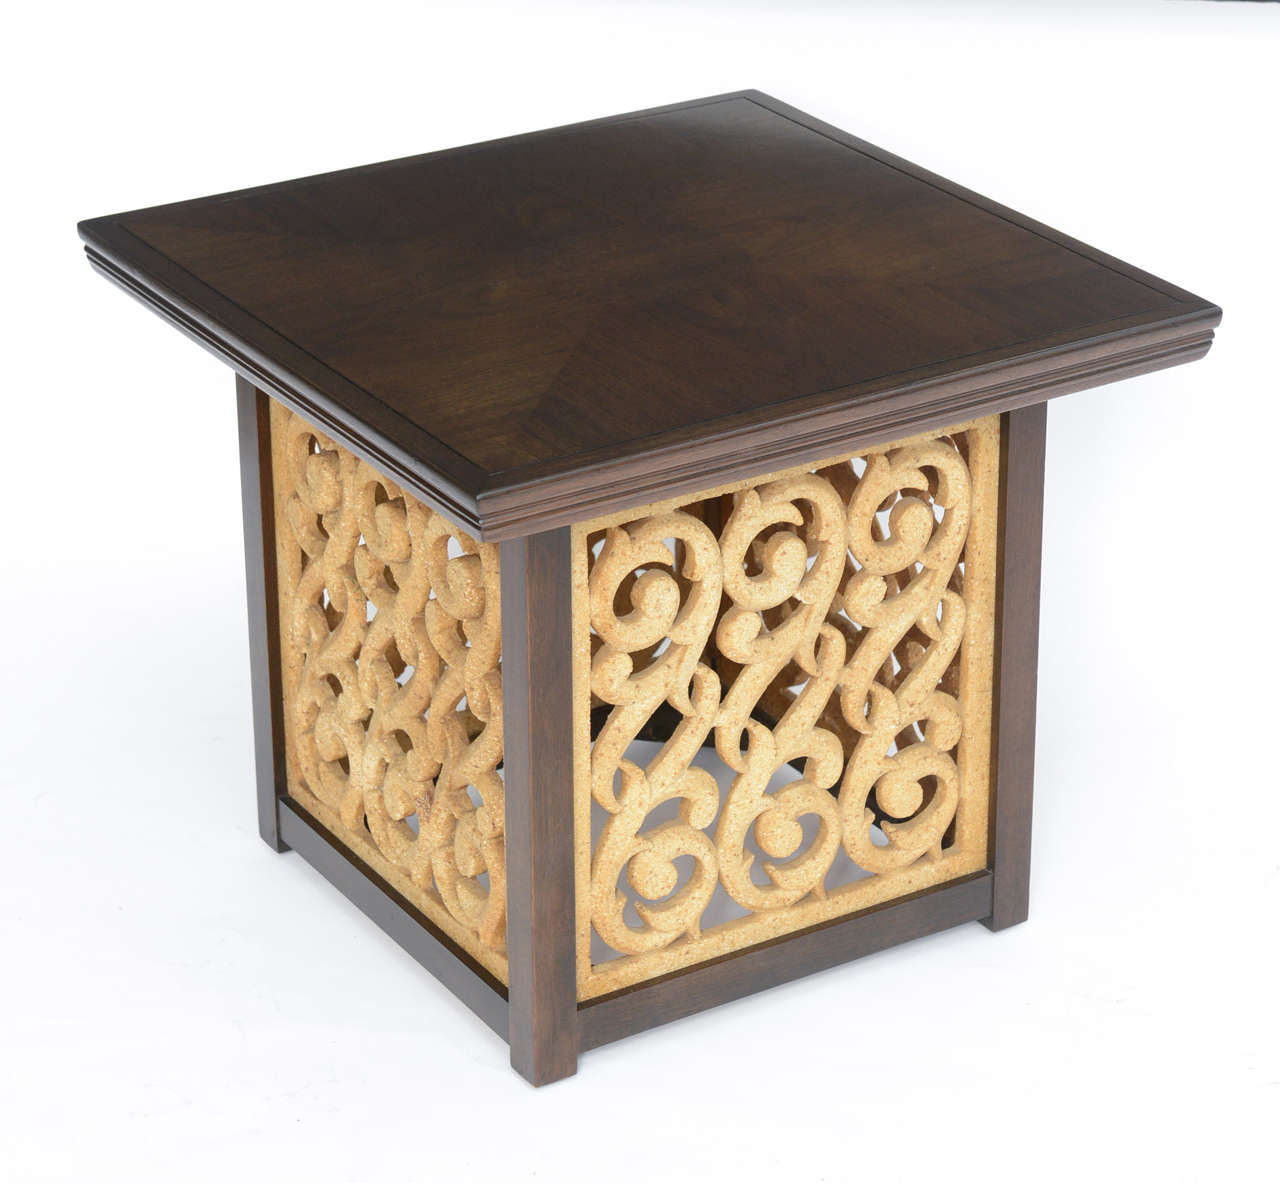 Hollywood Regency Elegant 1950s Detailed Widdicomb Side Table in Walnut For Sale